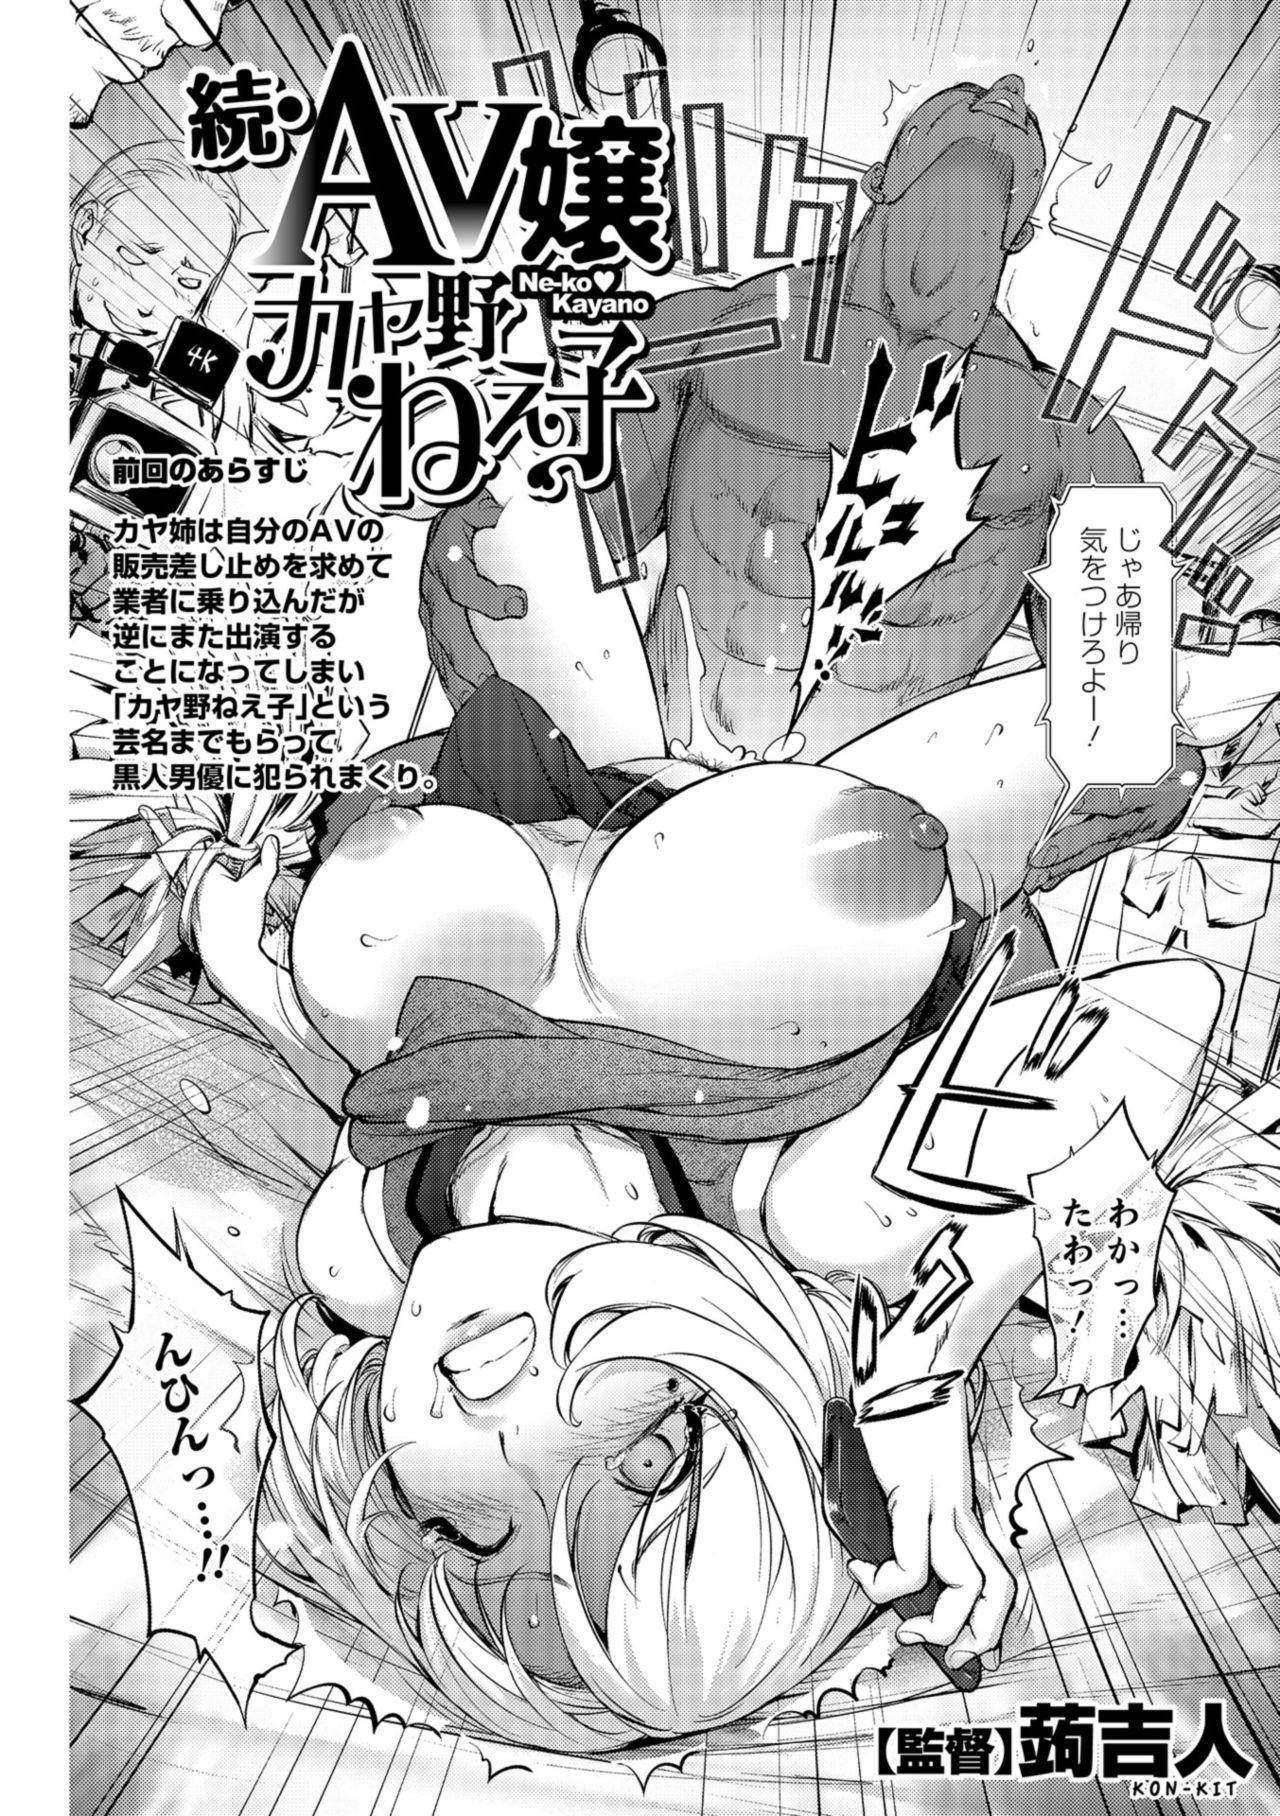 COMIC Shigekiteki SQUIRT!! Vol. 09 57